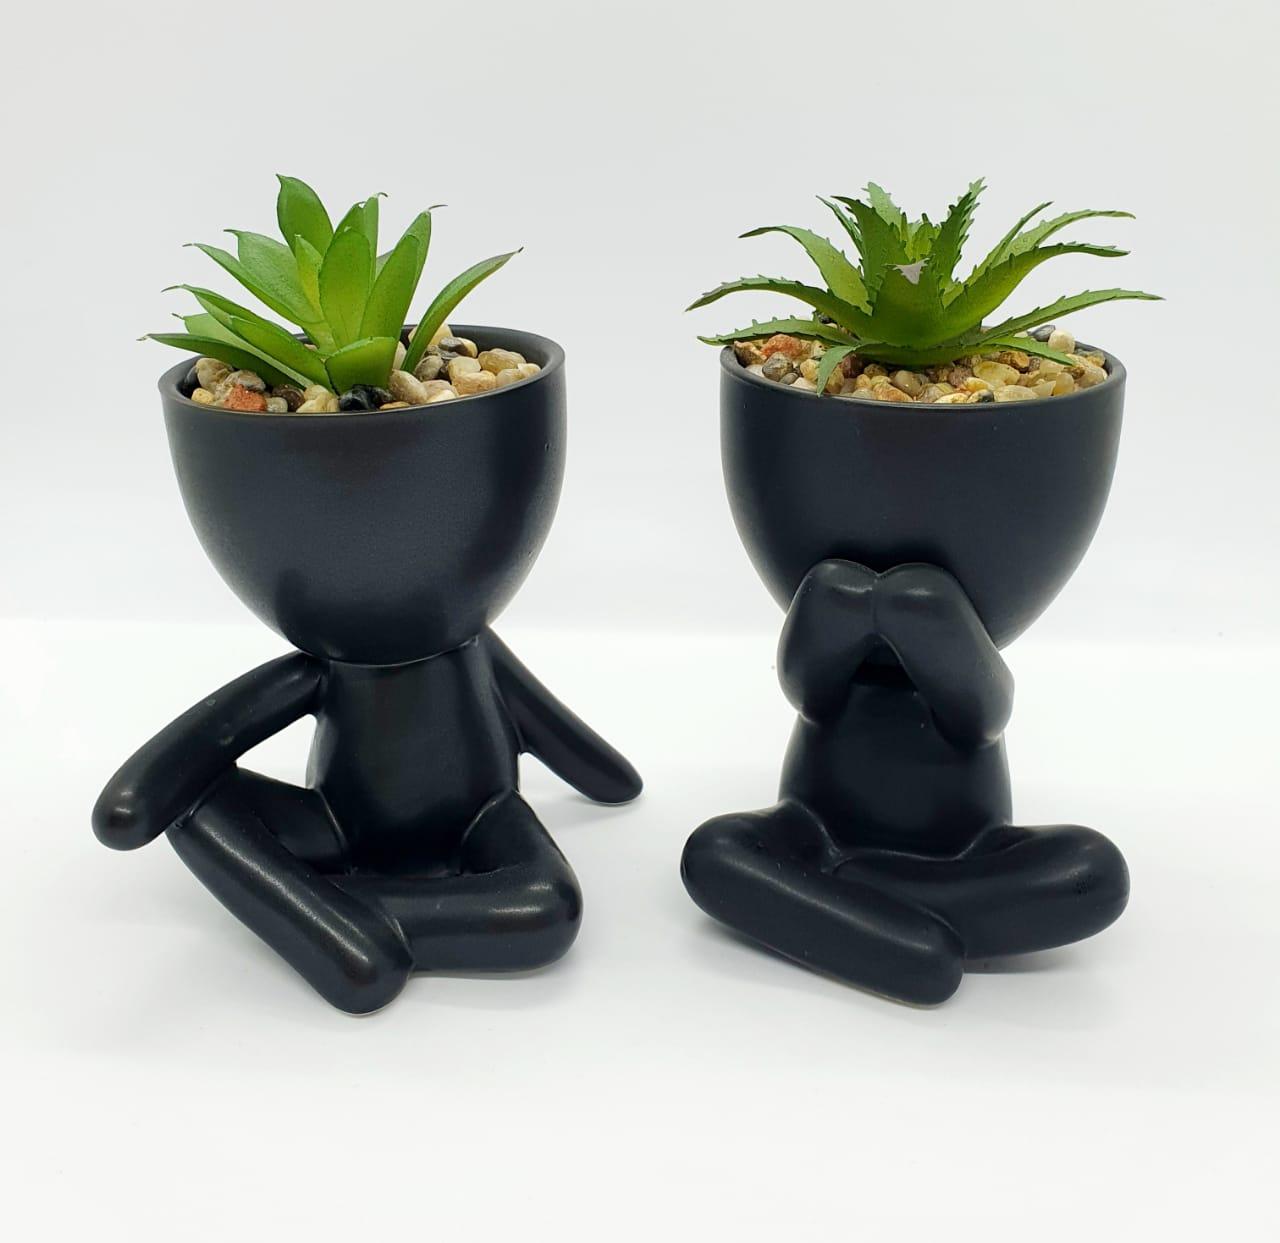 Kit - Vasos Mini Bobs pretos c/ plantas (2 peças)